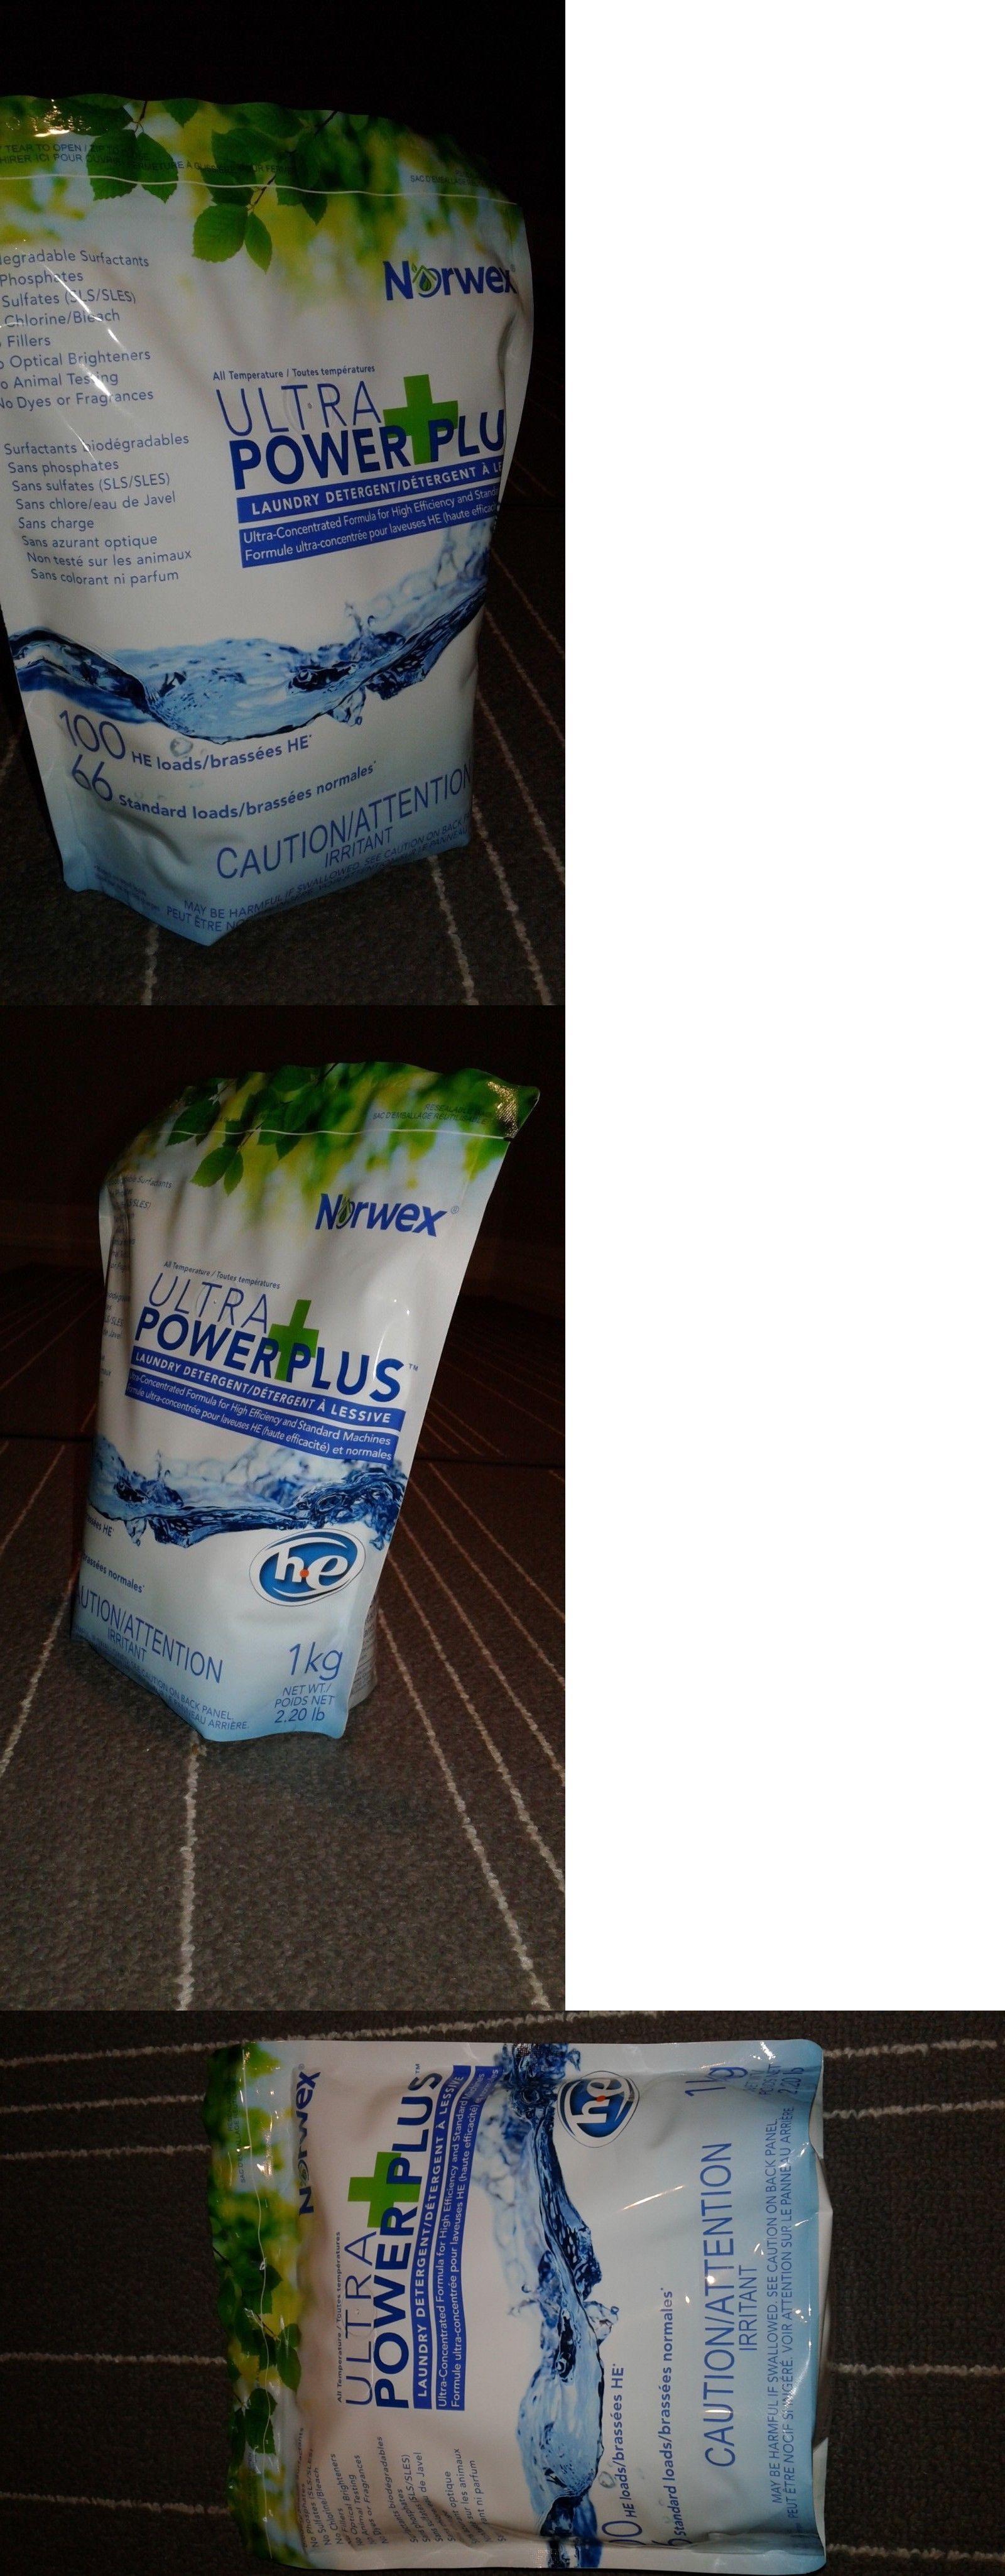 Detergents 78691 Norwex Ultra Power Plus Laundry